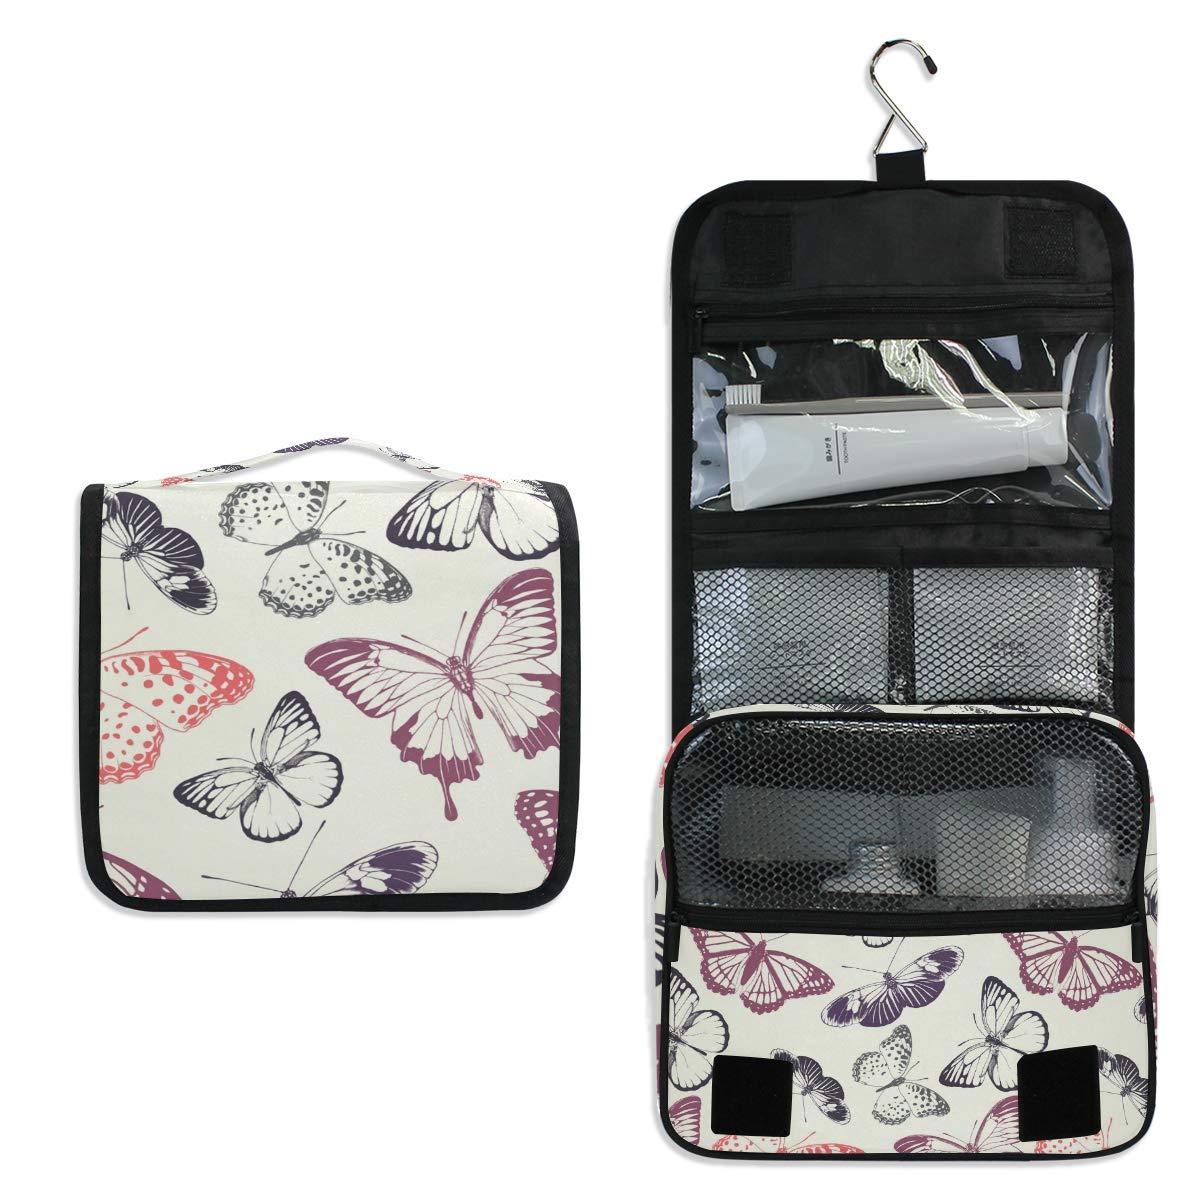 Toiletry Bag Travel Bag Hanging Hook - Butterflies Waterproof Cosmetic Bag Portable Makeup Pouch for Women Girls Men